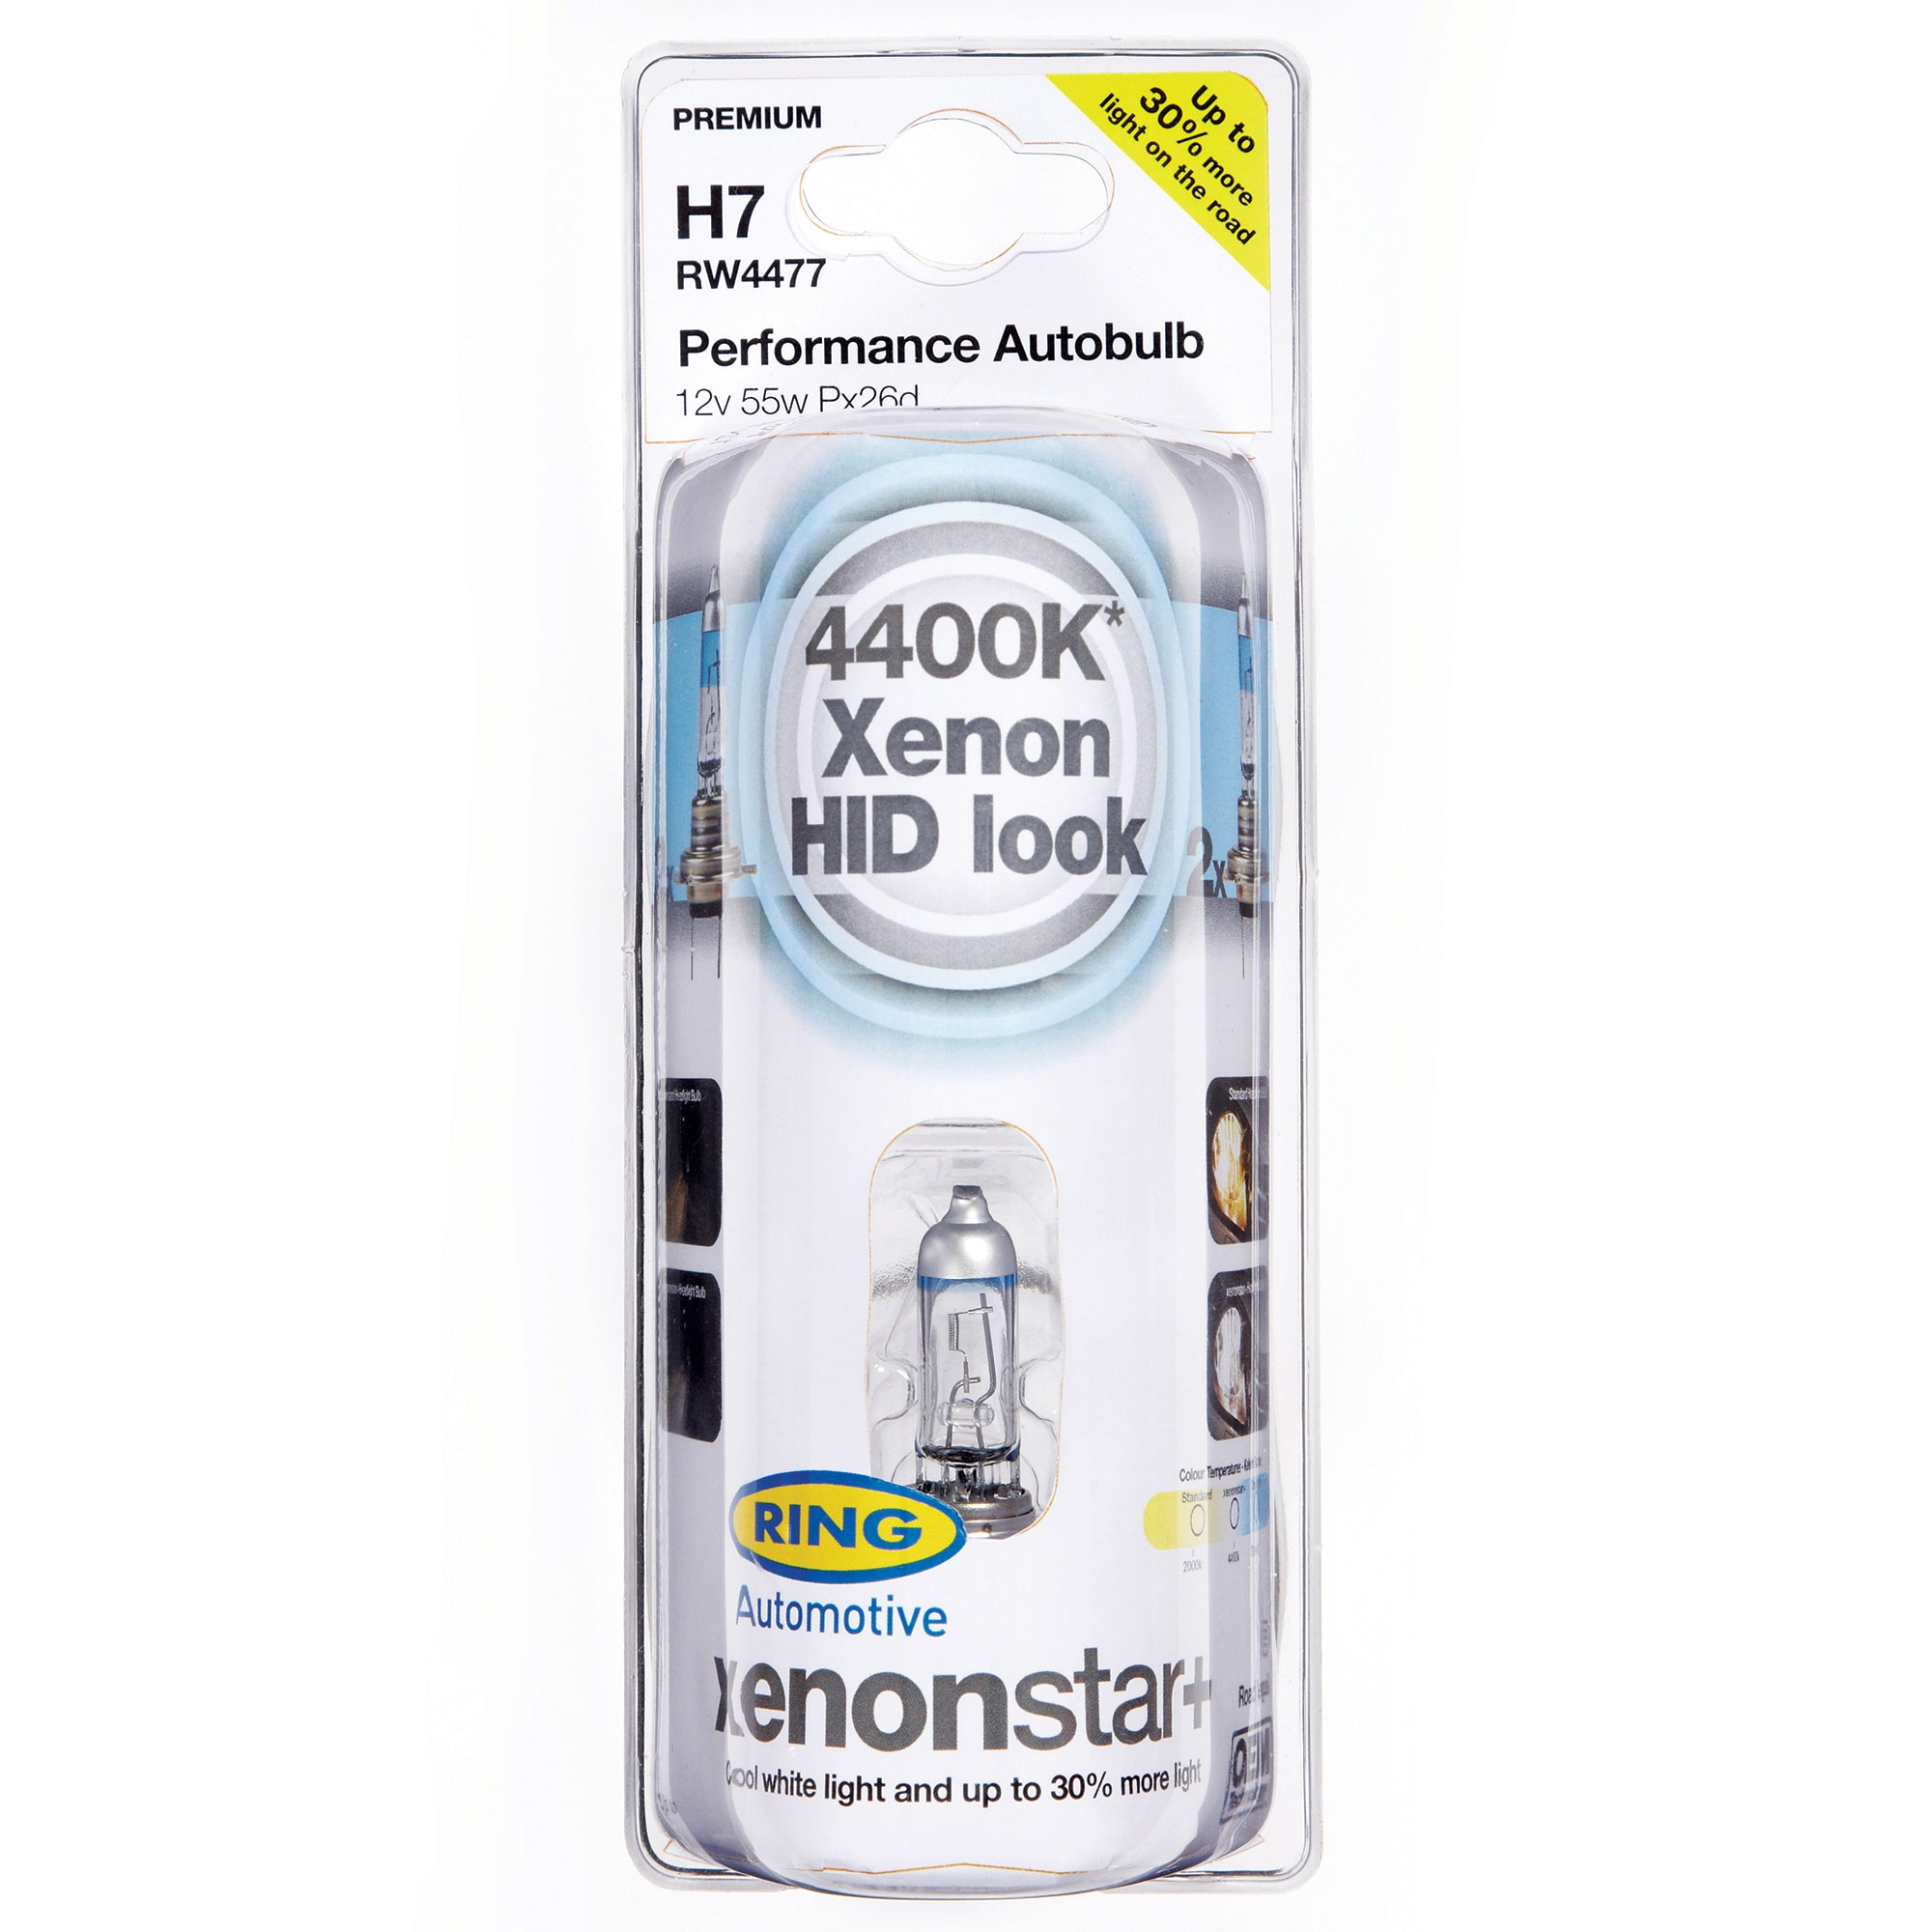 1401/W5/W Set of 2 Ring rew4472/V Xenon Lamp 4400/K and 30/% H4/12/V